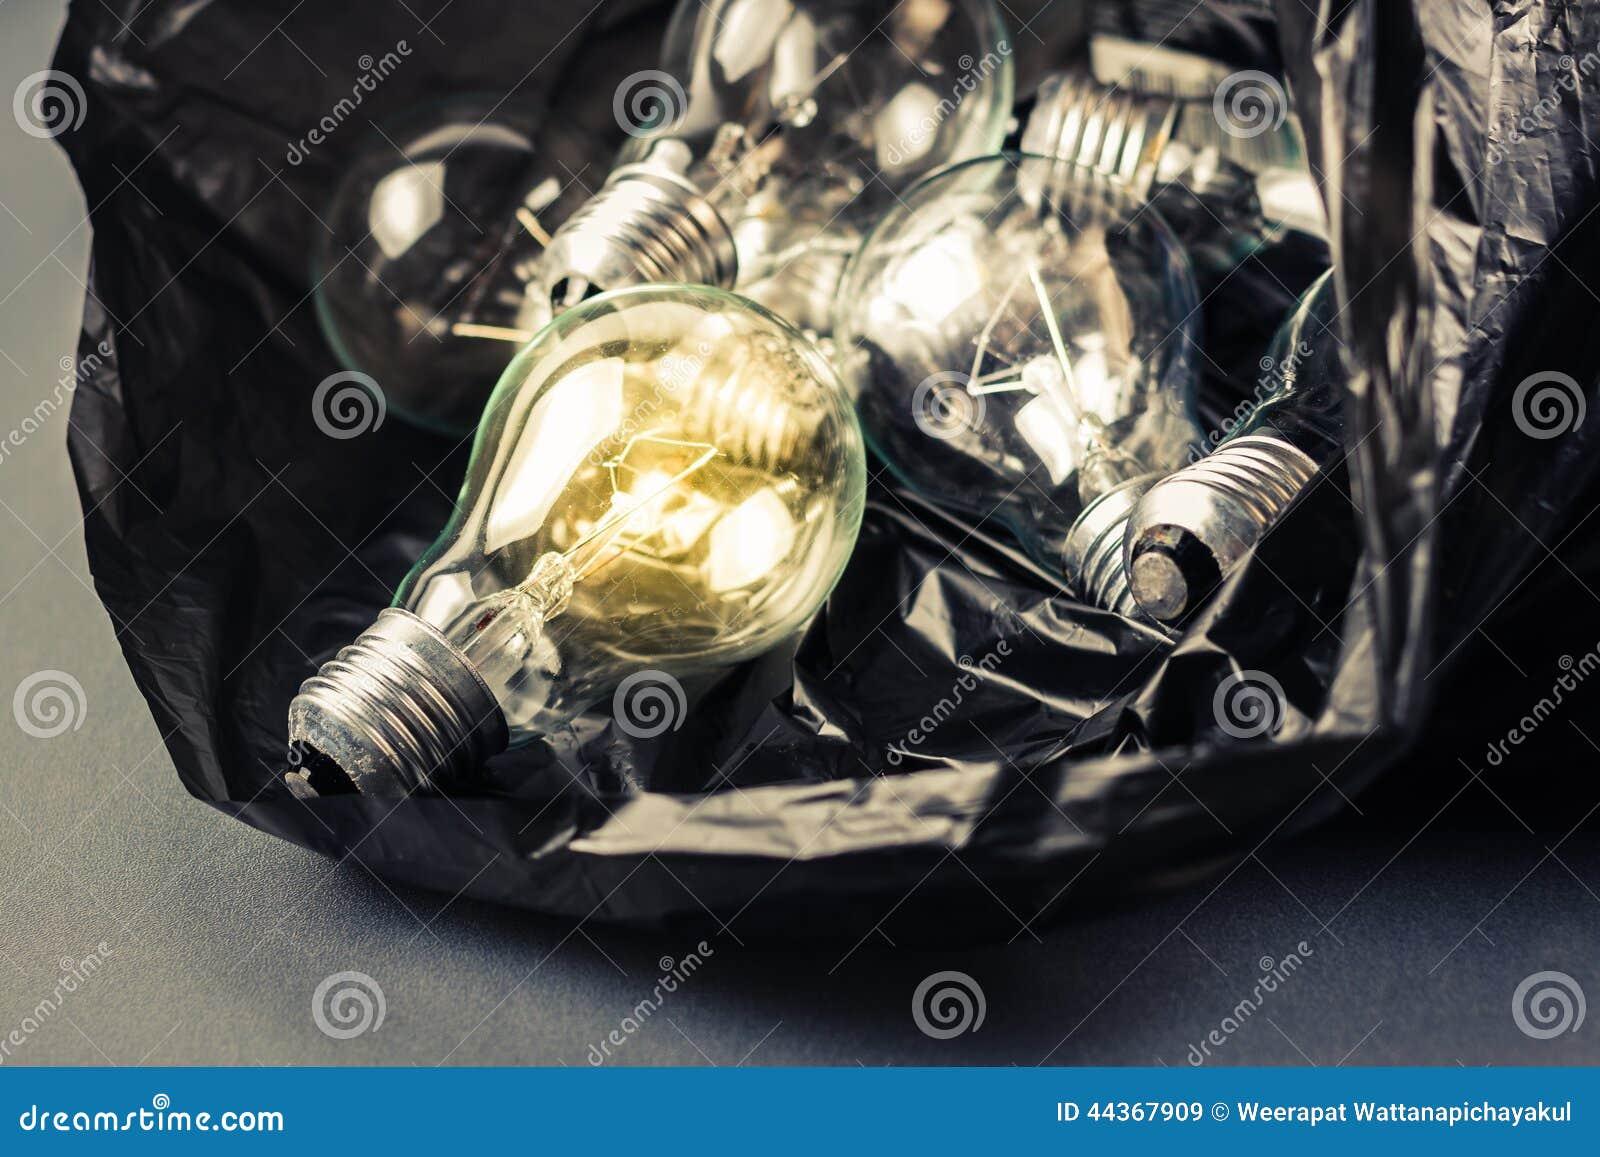 Lampada in borsa